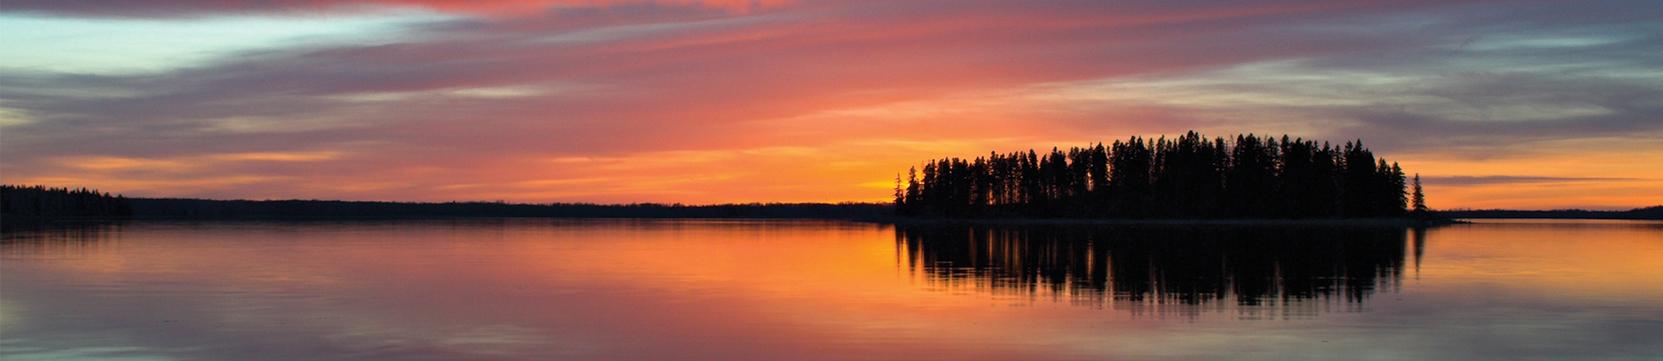 Algonquin Island sunset